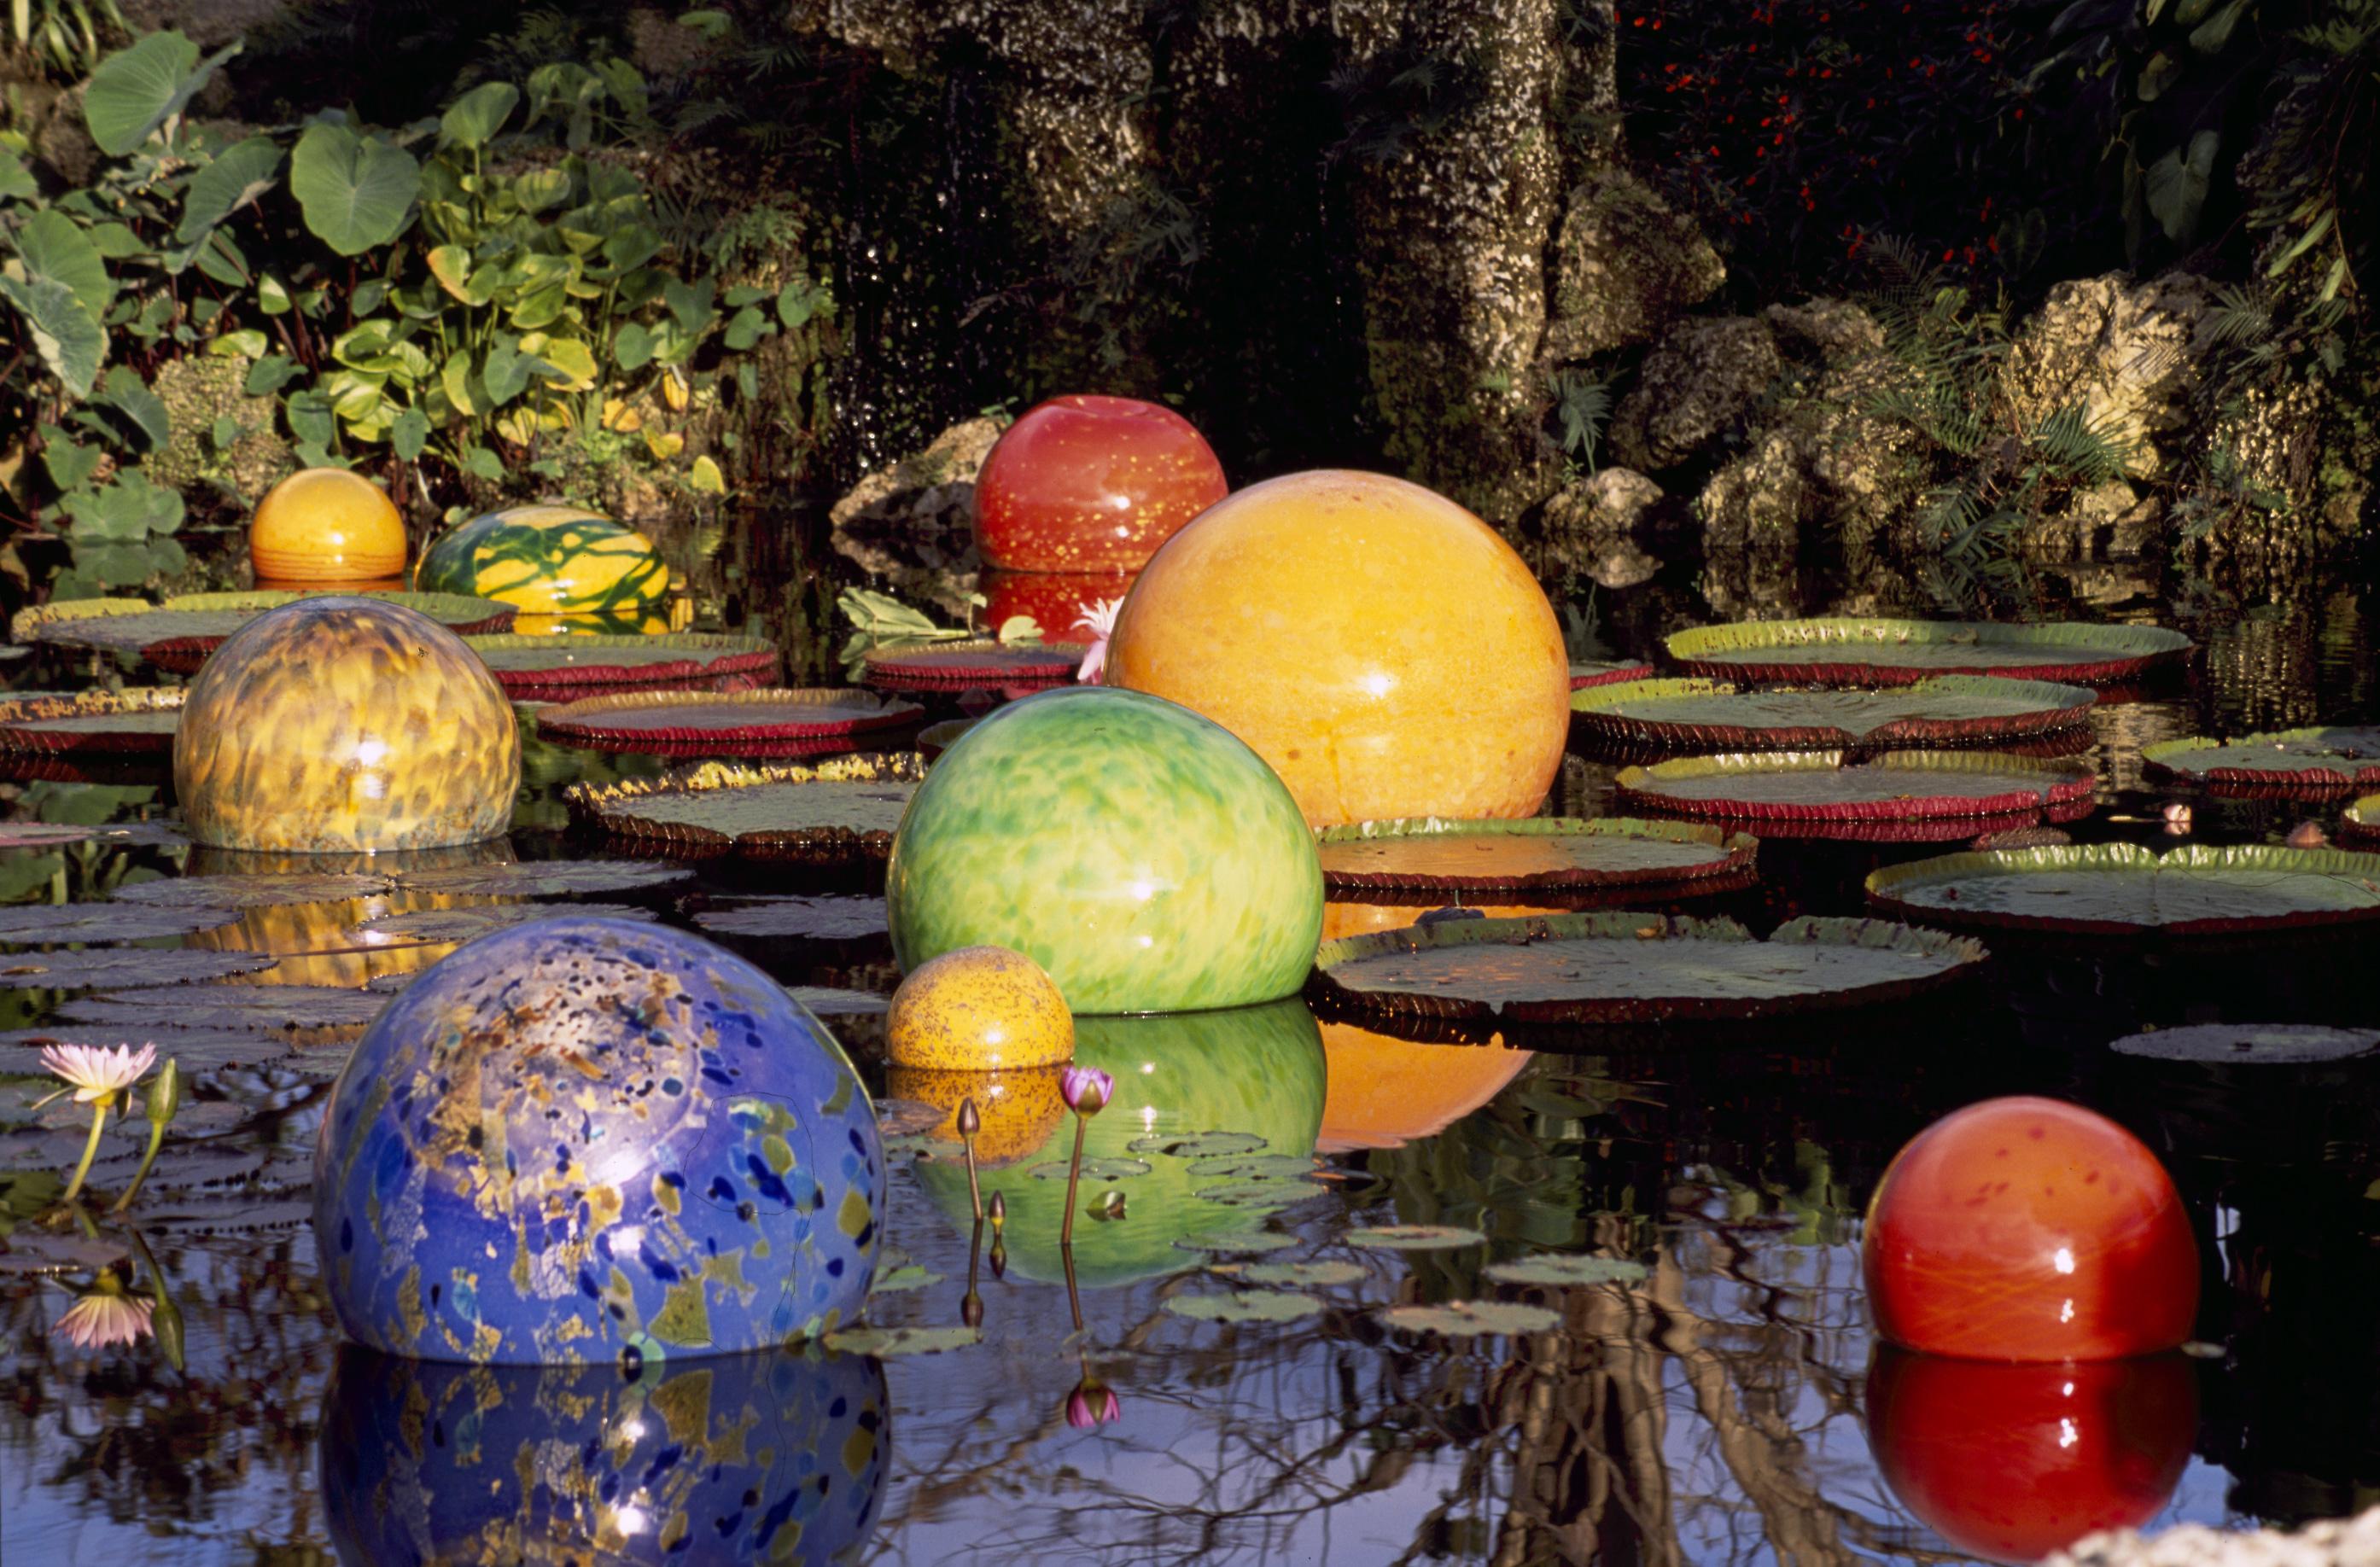 http://www.virtualherbarium.org/Chihuly/images/LARGE/Niijima-Floats,-1992-1997.jpg